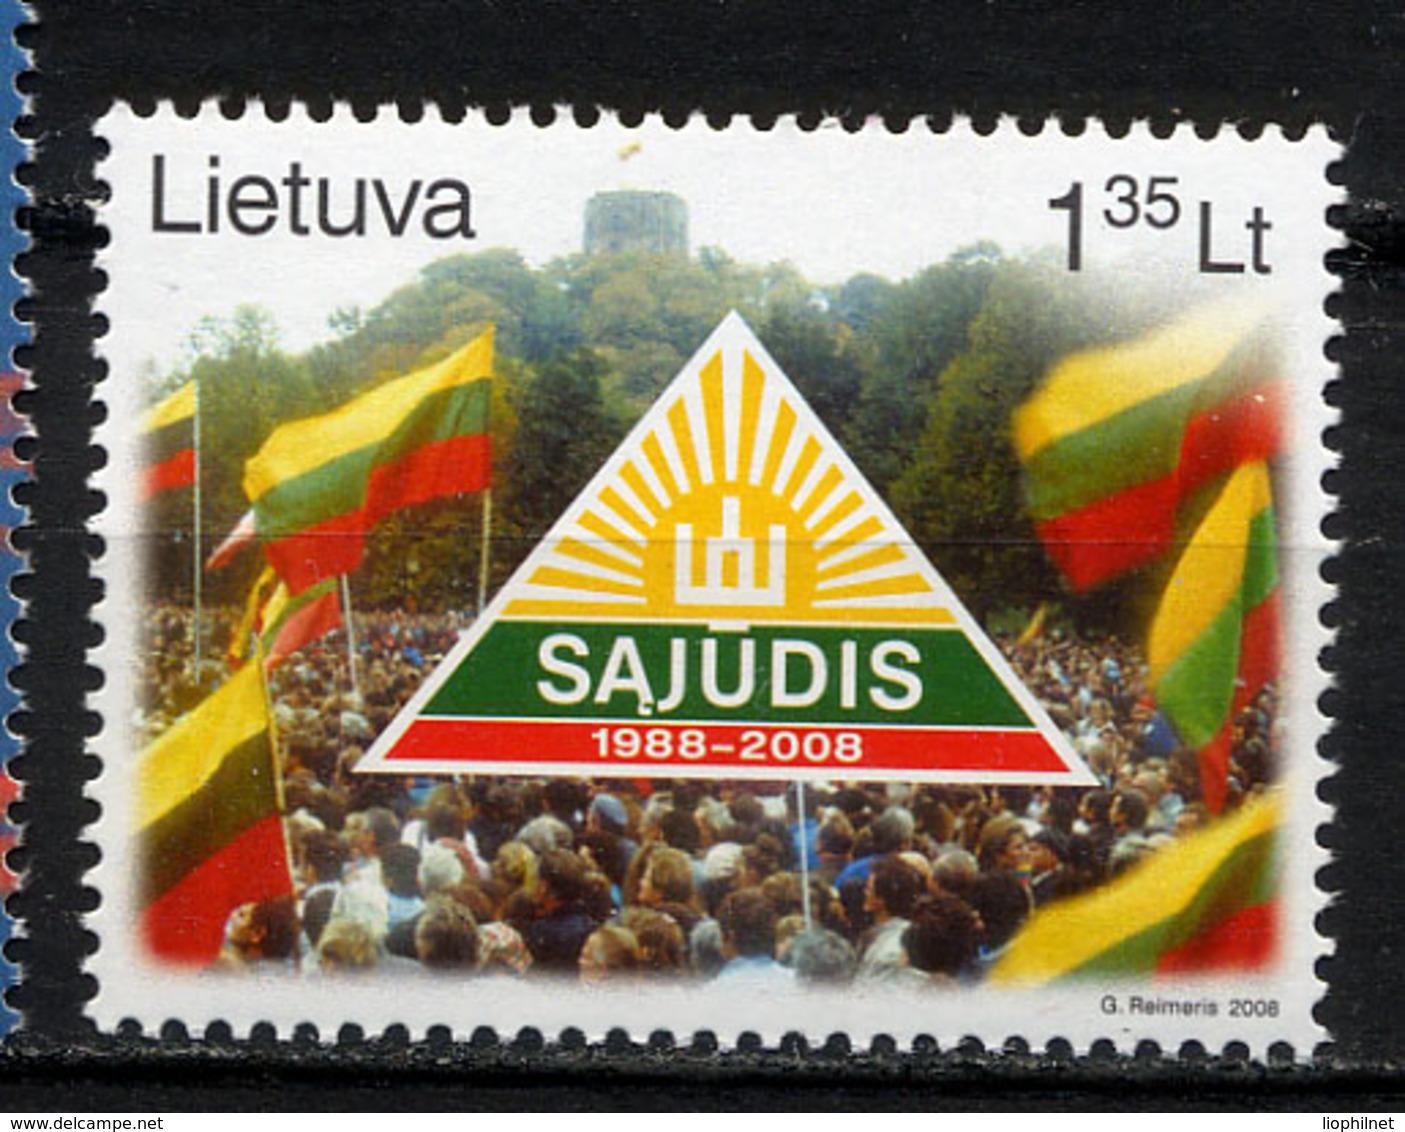 LITUANIE LIETUVA 2008, Mouvement SAJUDIS, 1 Valeur, Neuf / Mint. R1776 - Litauen